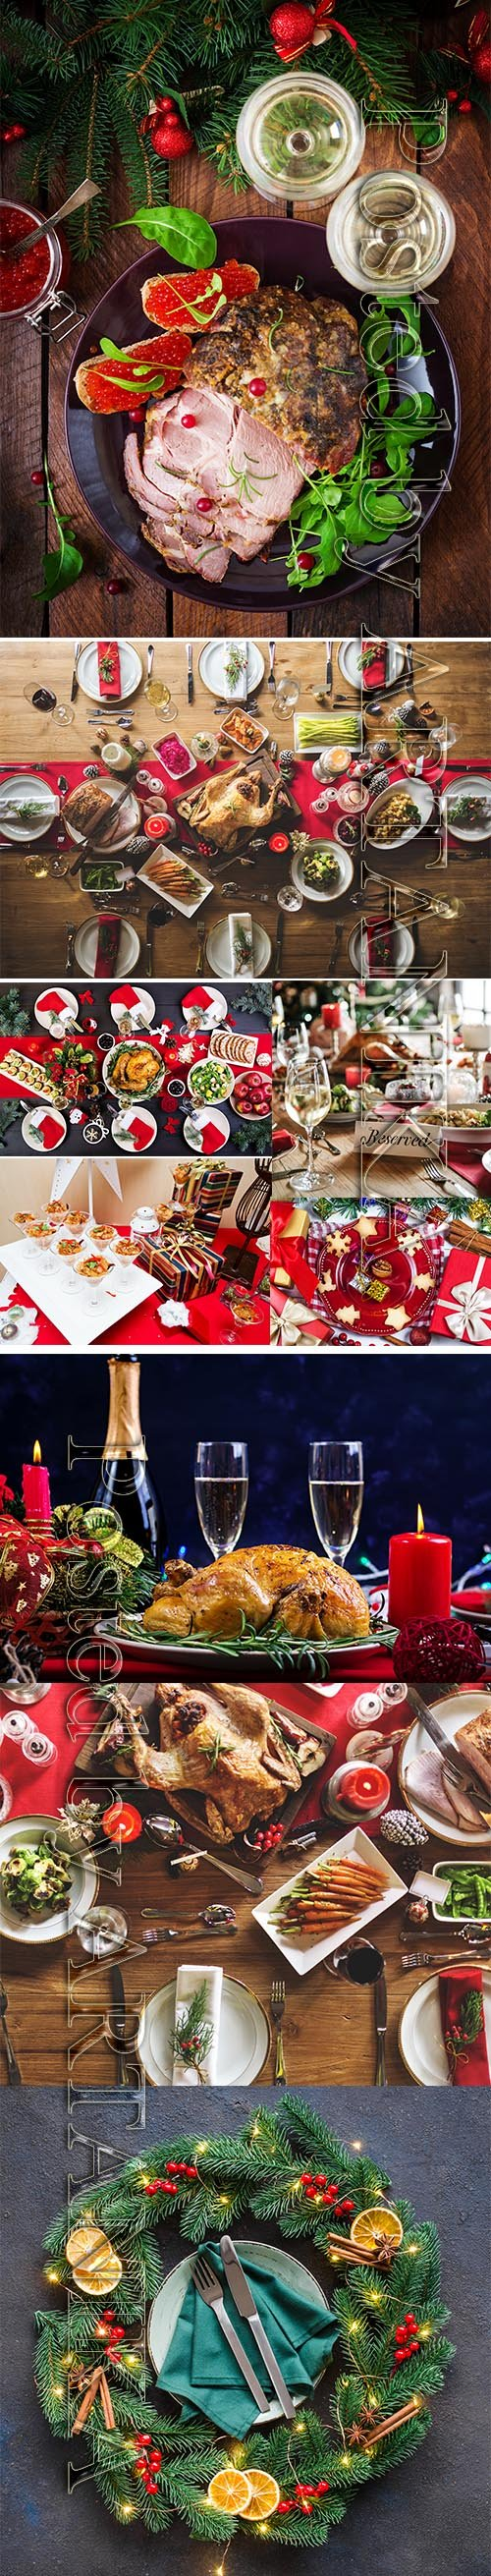 Christmas Family Dinner Stock Images Vol 2